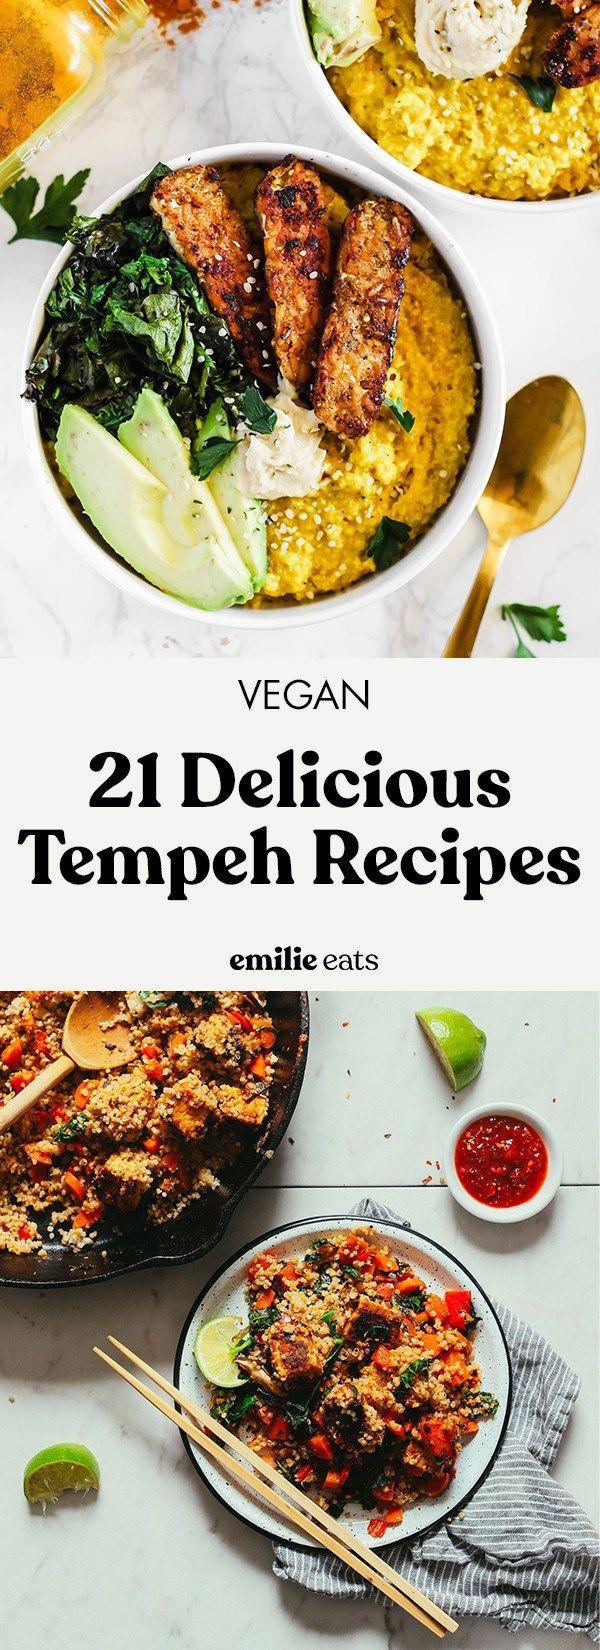 21 Delicious Vegan Tempeh Recipes – Emilie Eats